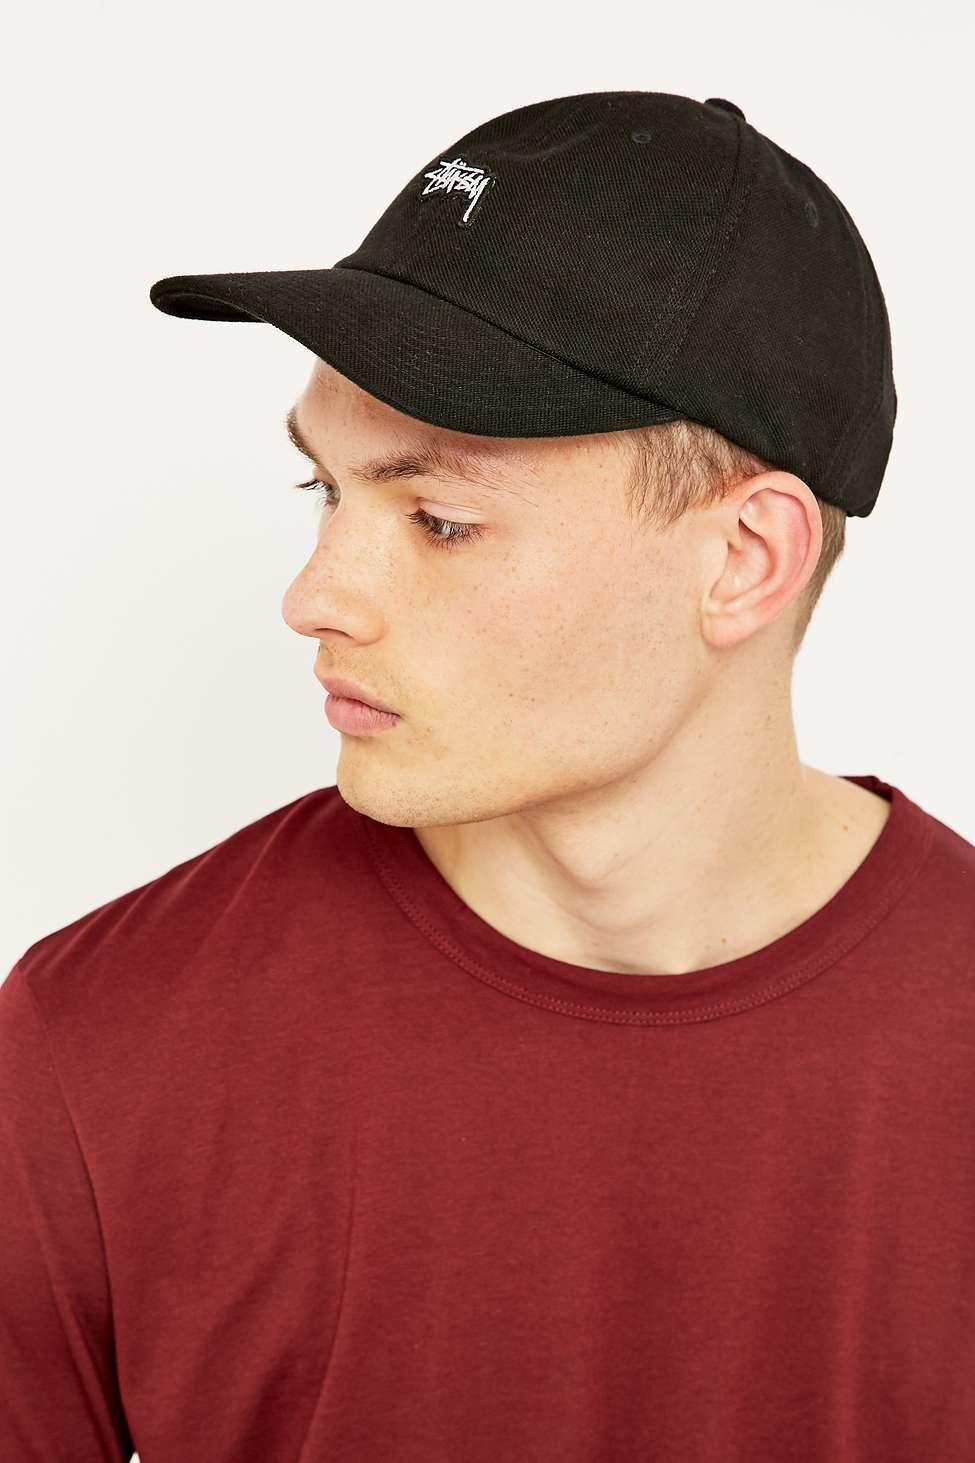 Stussy Stock Pique Black Cap in Black for Men - Lyst 03592c9463b